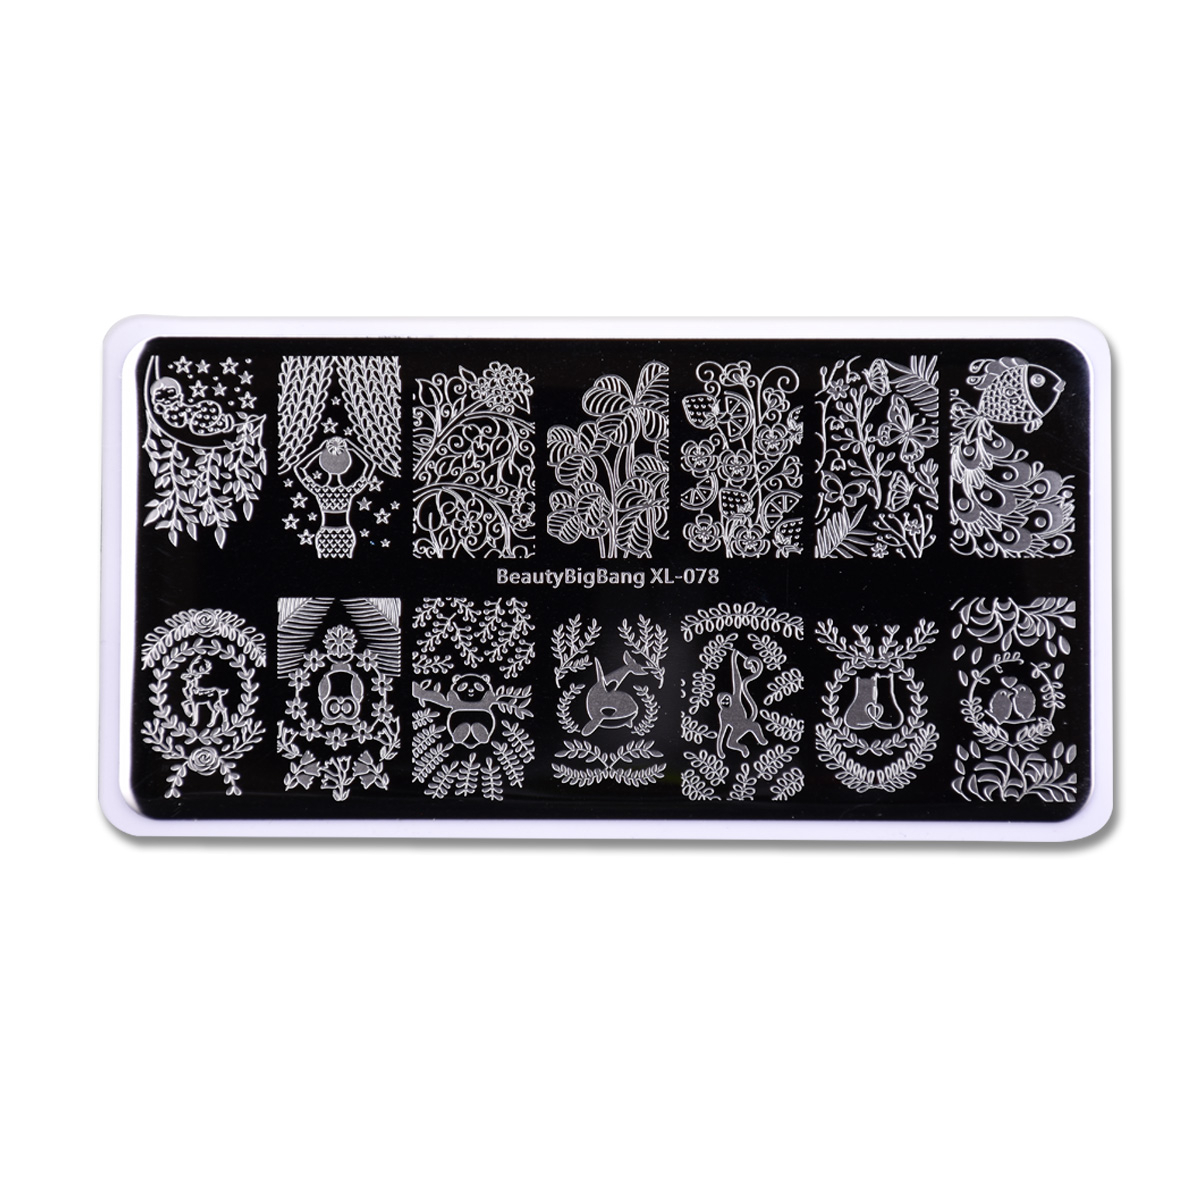 Beautybigbang placas de carimbo molde da arte